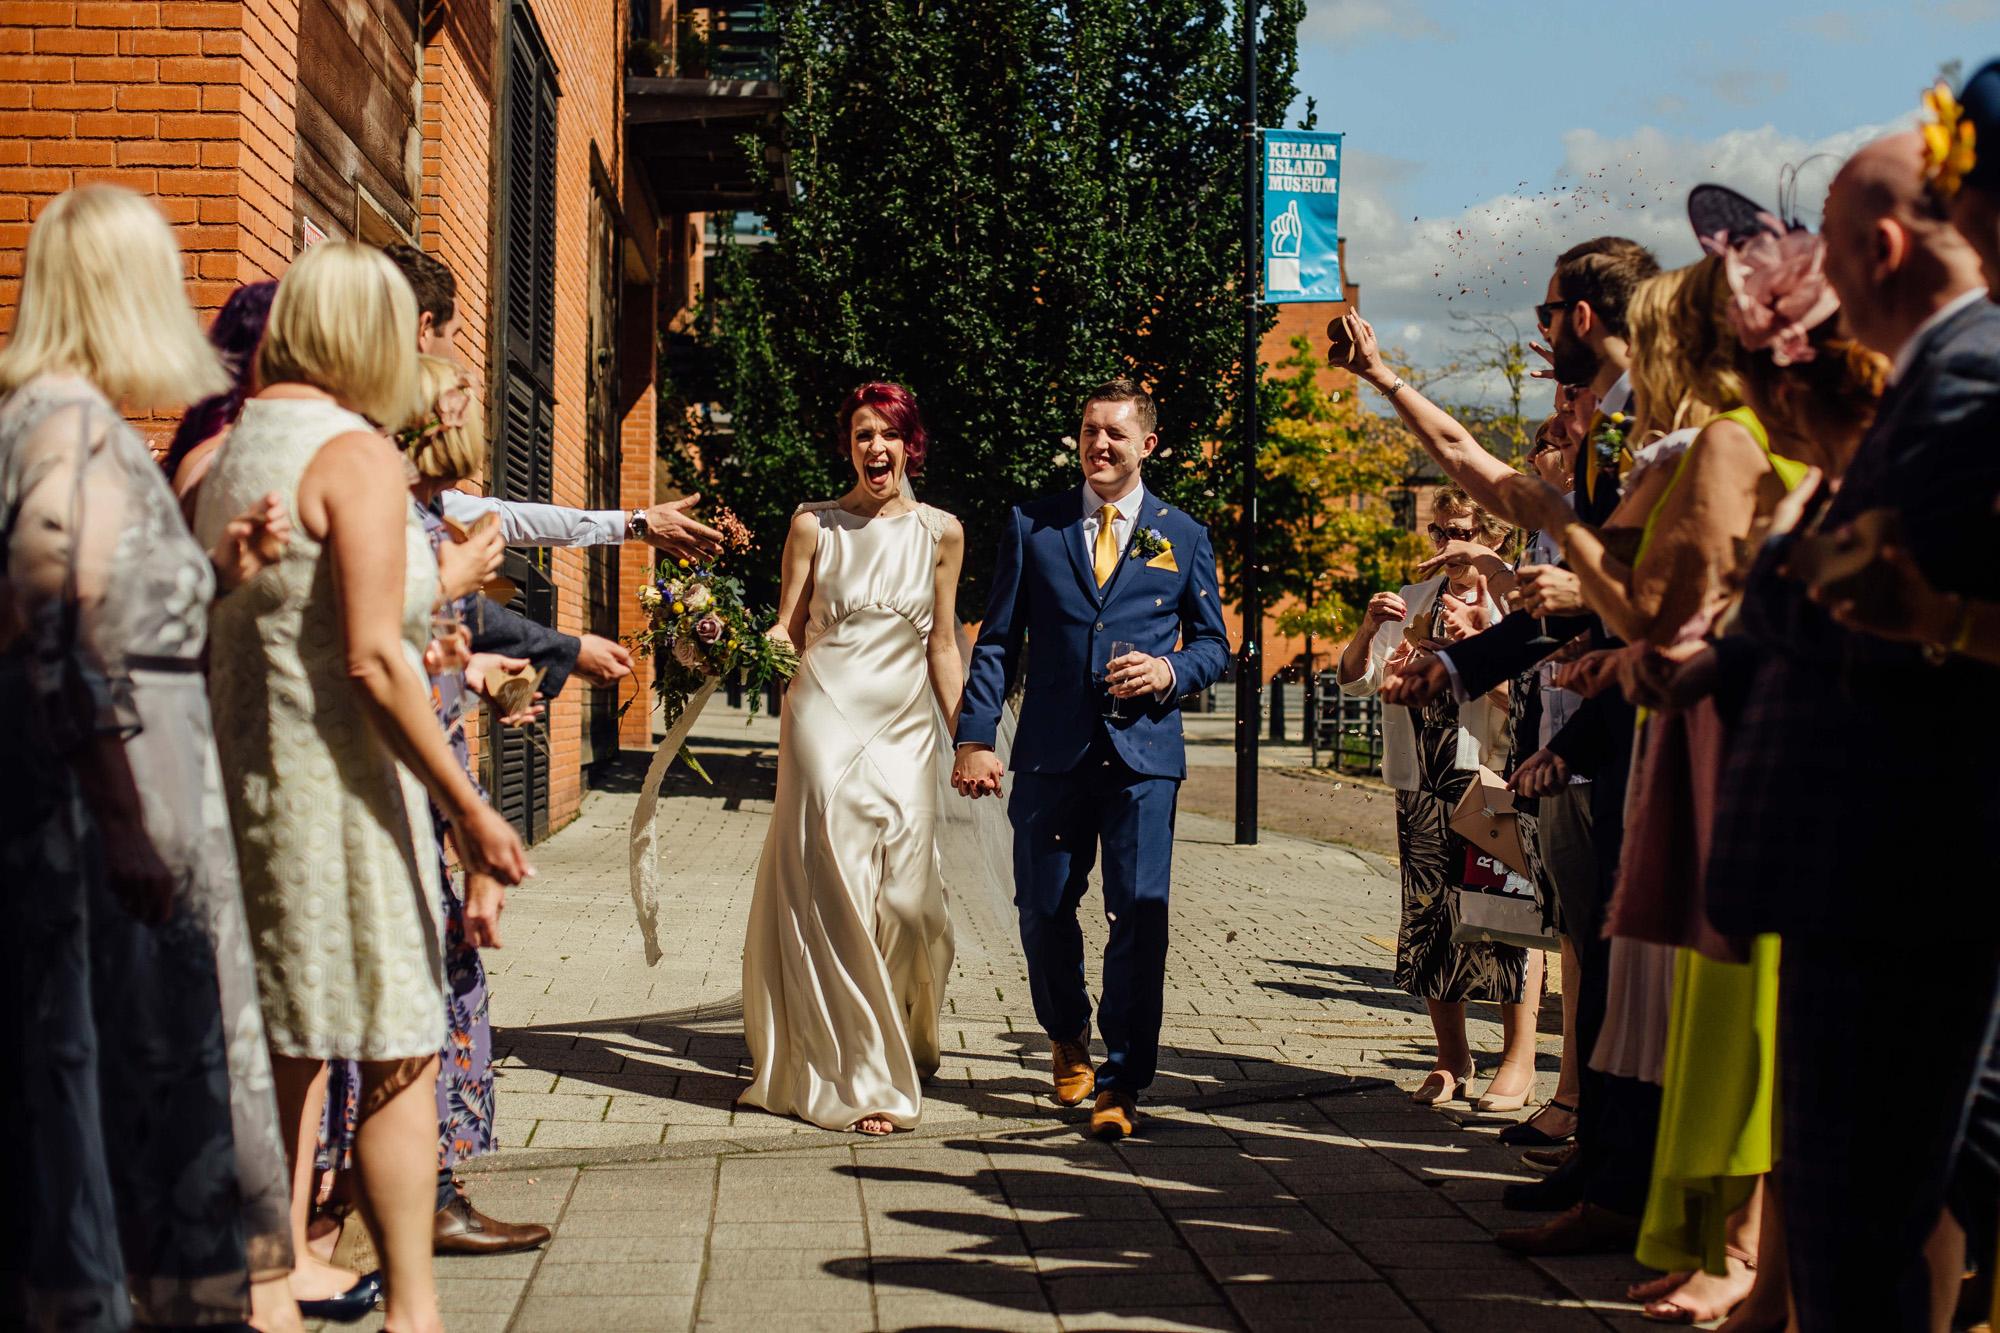 Sarah-Honeysuckle-Bias-Cut-Silk-Vintage-Inspired-Wedding-Gown-Sheffield-Wedding-Kate-Beaumont-43.jpg